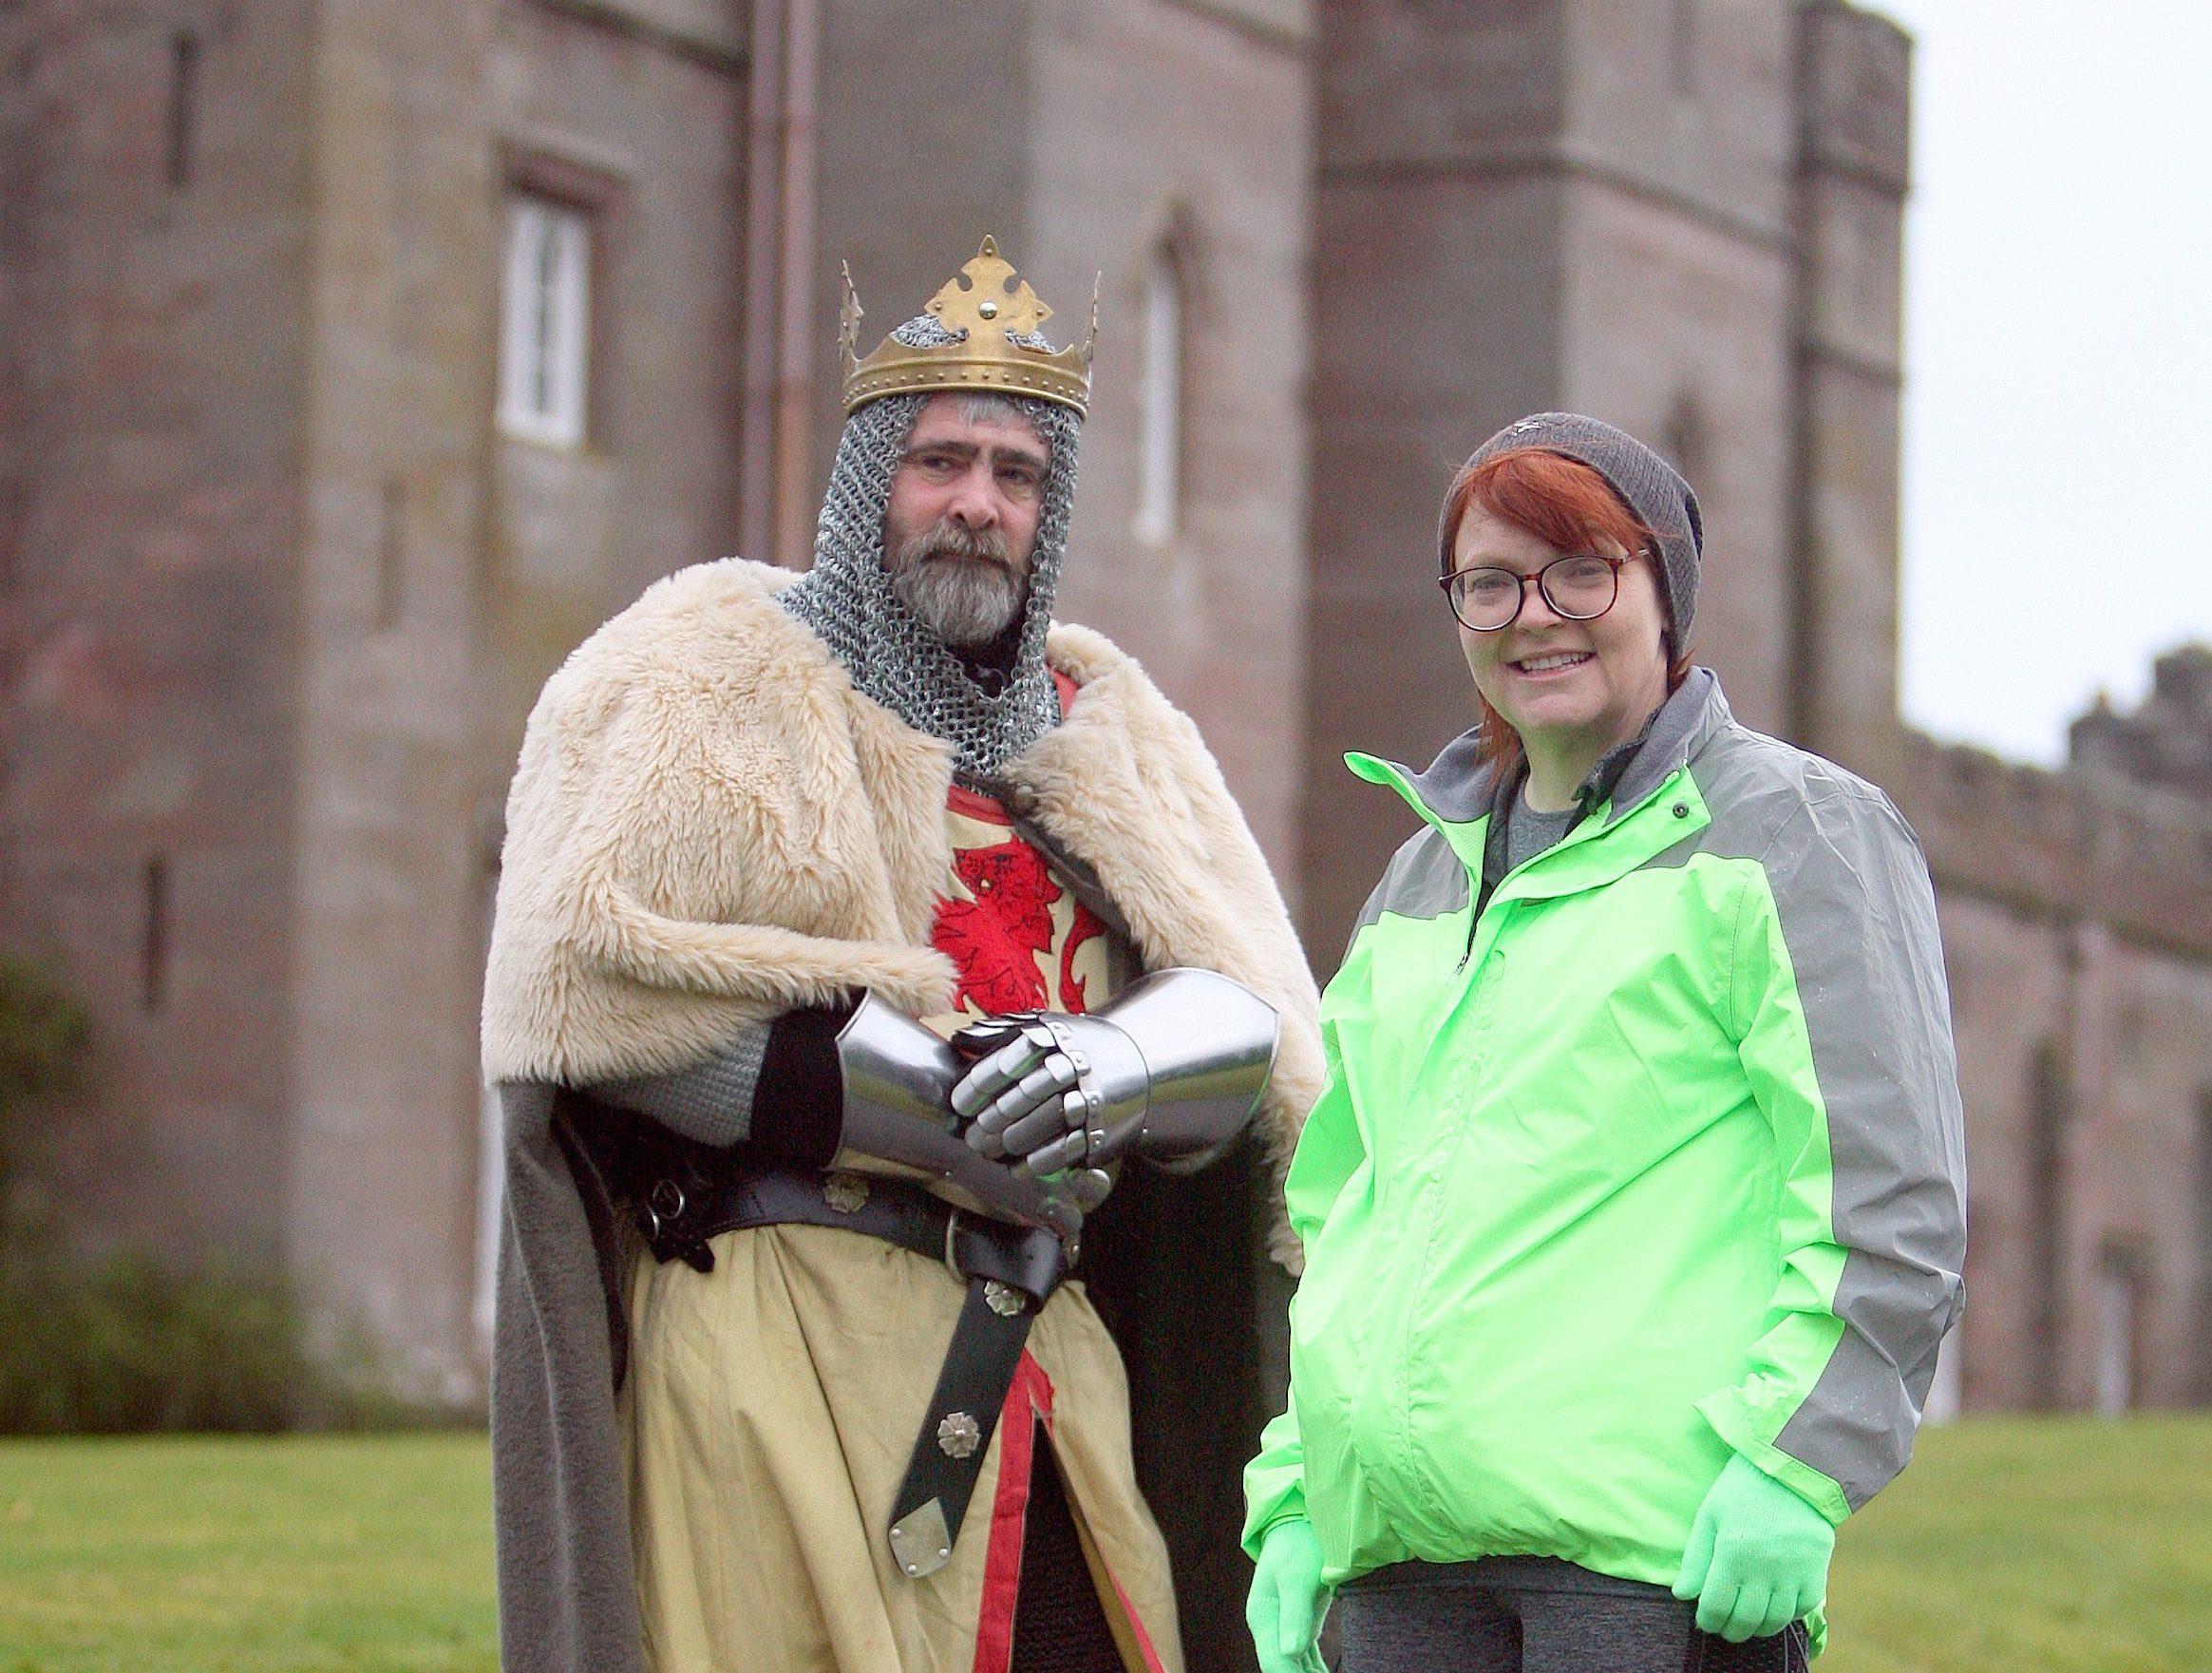 Brian McCutcheon as Robert the Bruce with partner Gina Craig at Scone Palace.